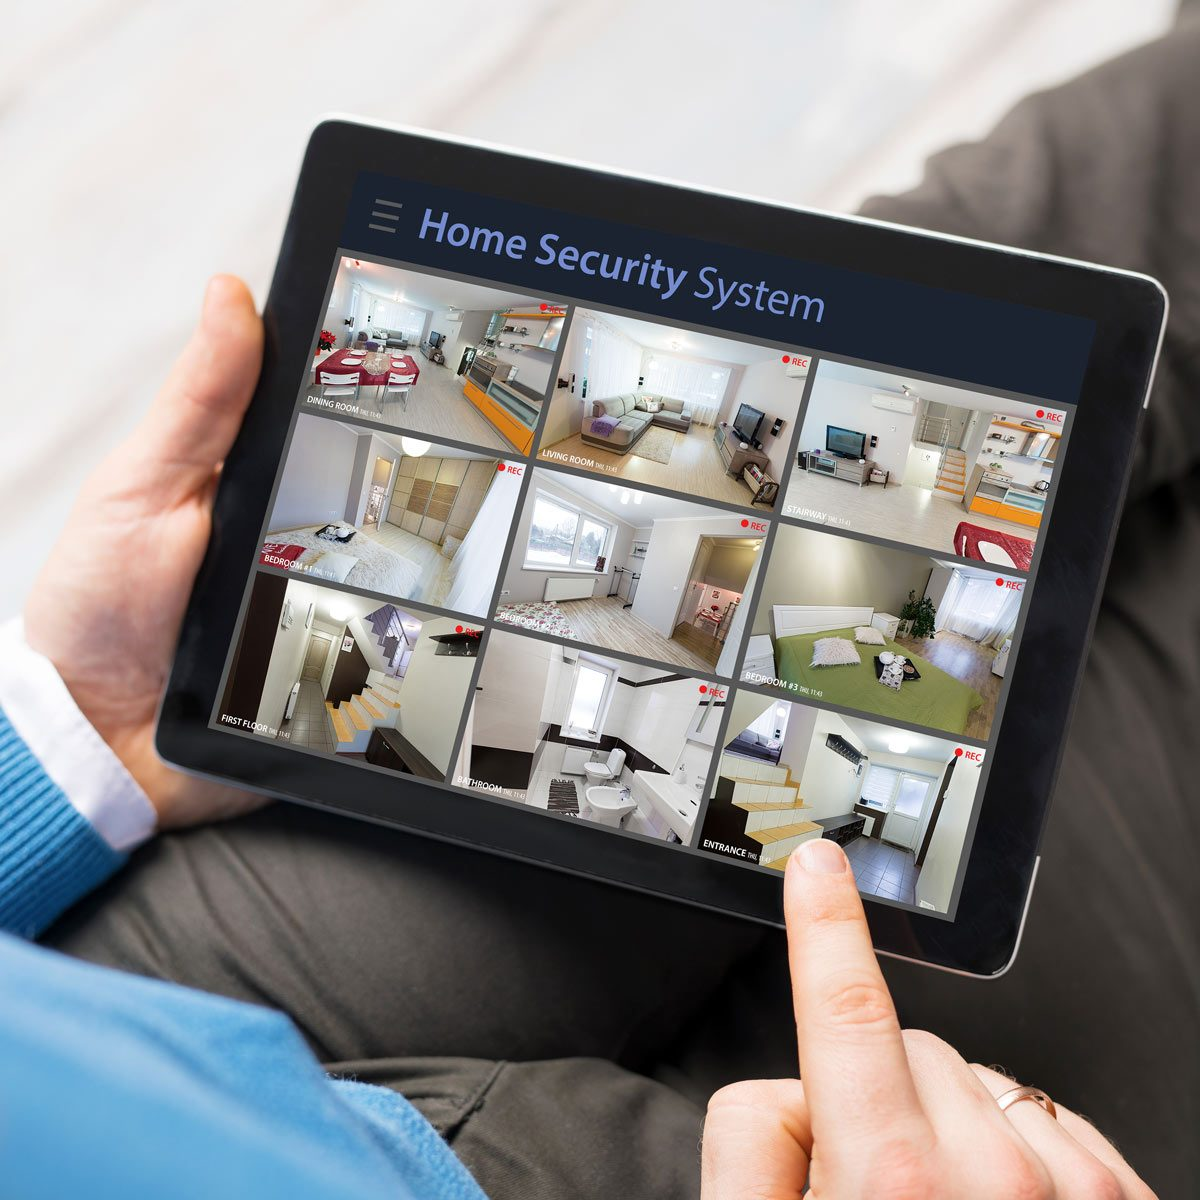 security camera system footage app